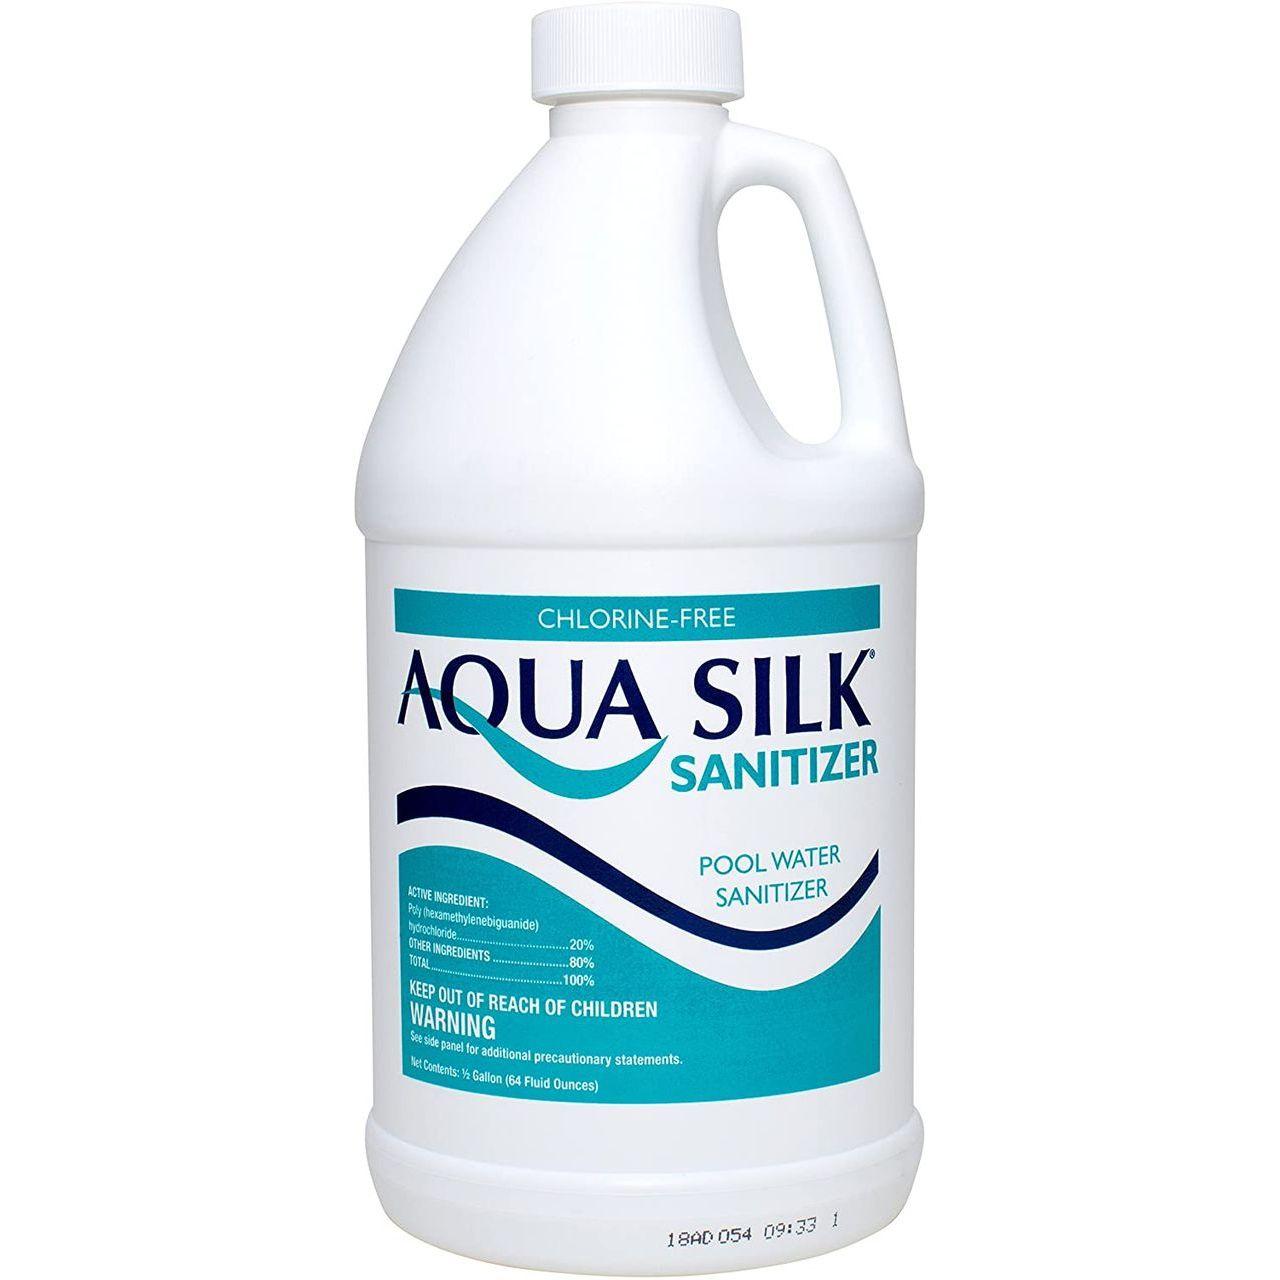 Aqua Silk 1/2 Gallon Pool Water Sanitizer